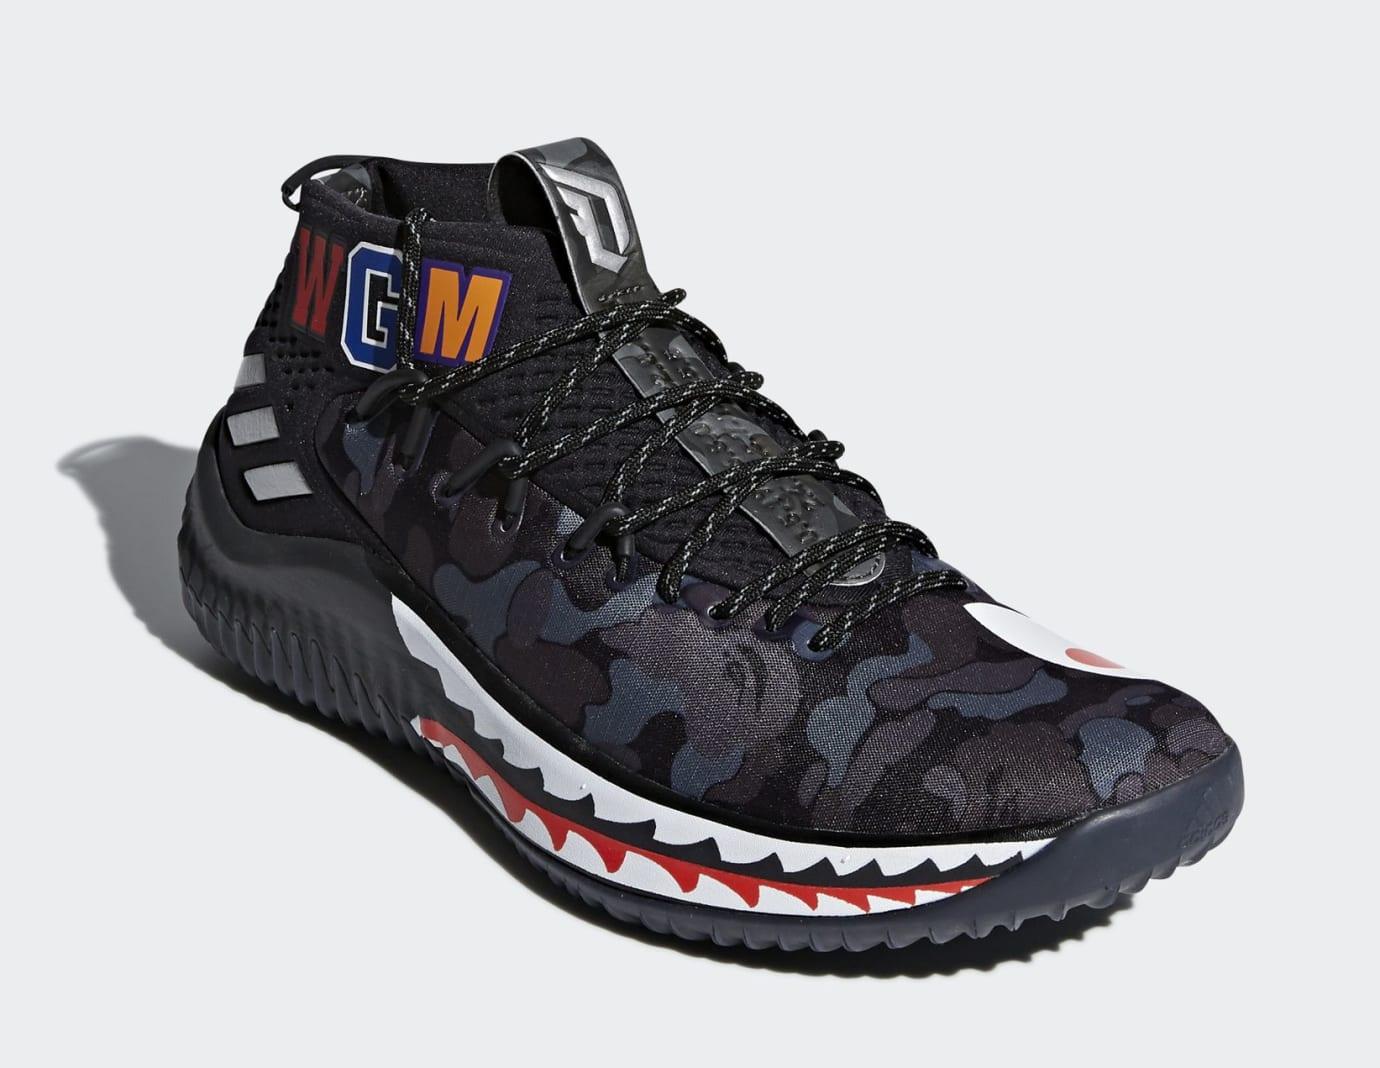 BAPE x Adidas Dame 4 'Black Camo' AP9975 (Toe)